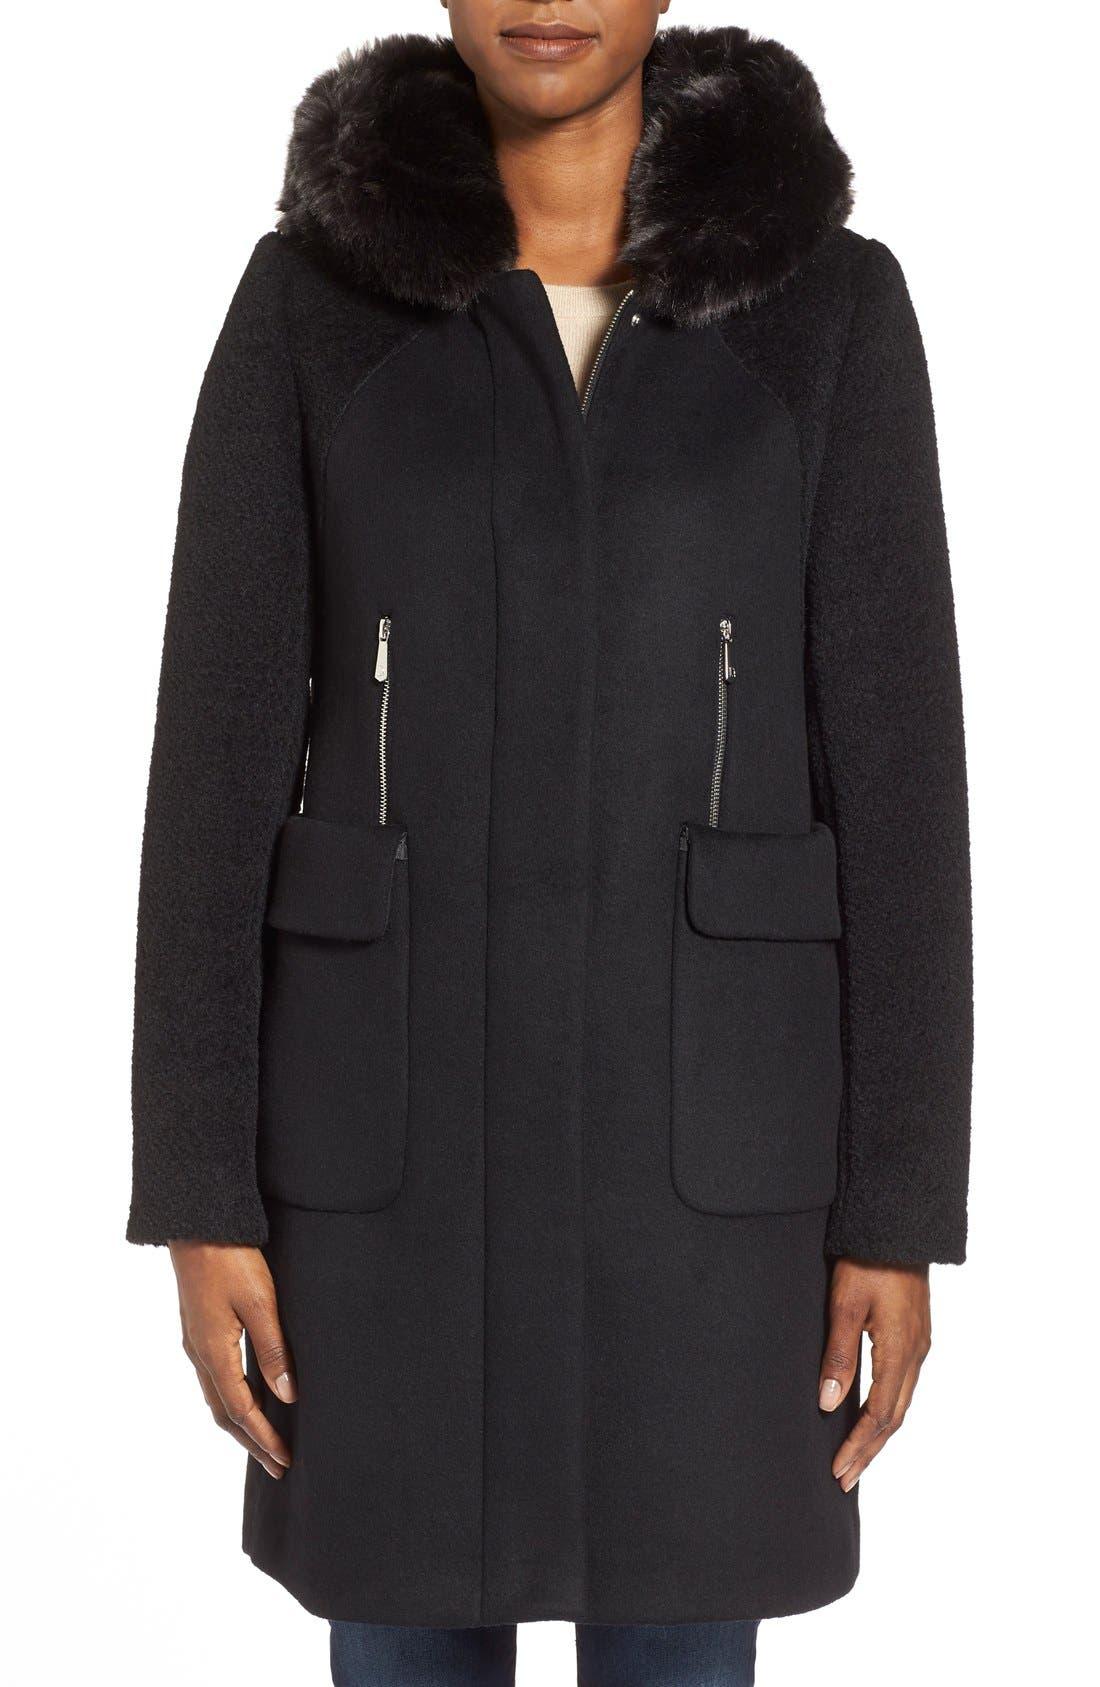 Alternate Image 1 Selected - Dawn Levy 'Lara' Mixed Media Wool Blend Coat withFauxFur Hood